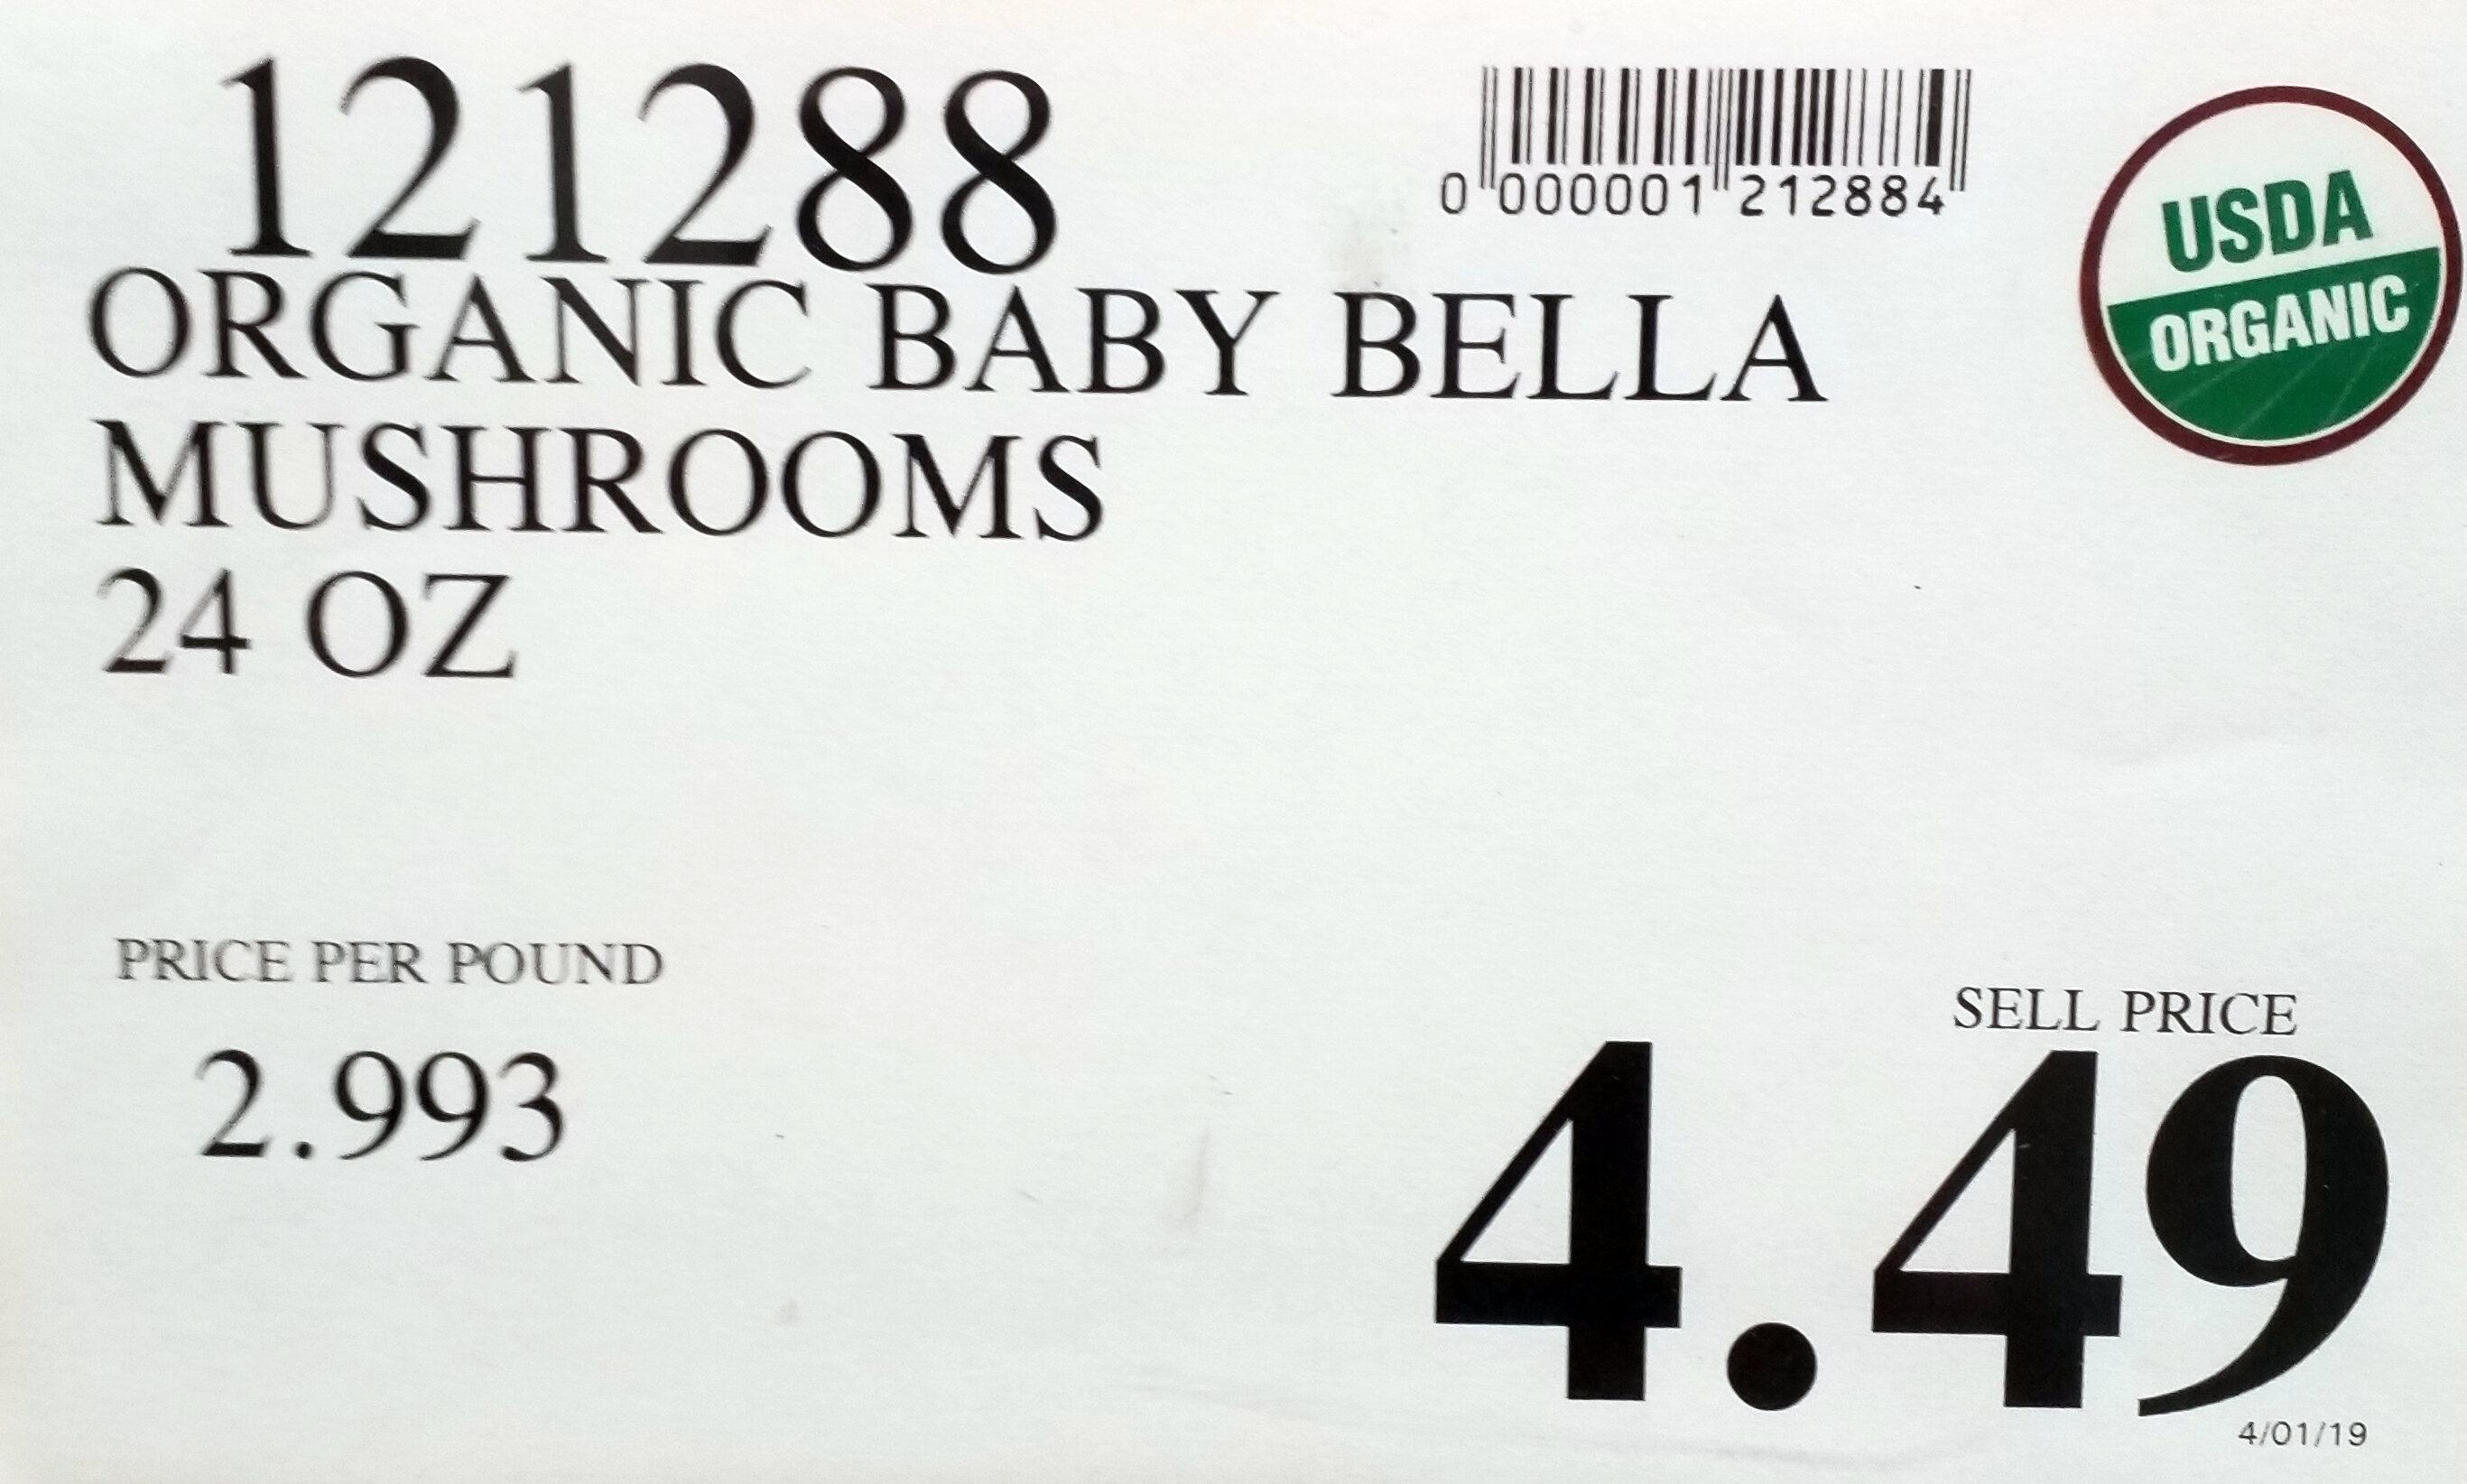 Organic Baby Bella Mushrooms - Ingredients